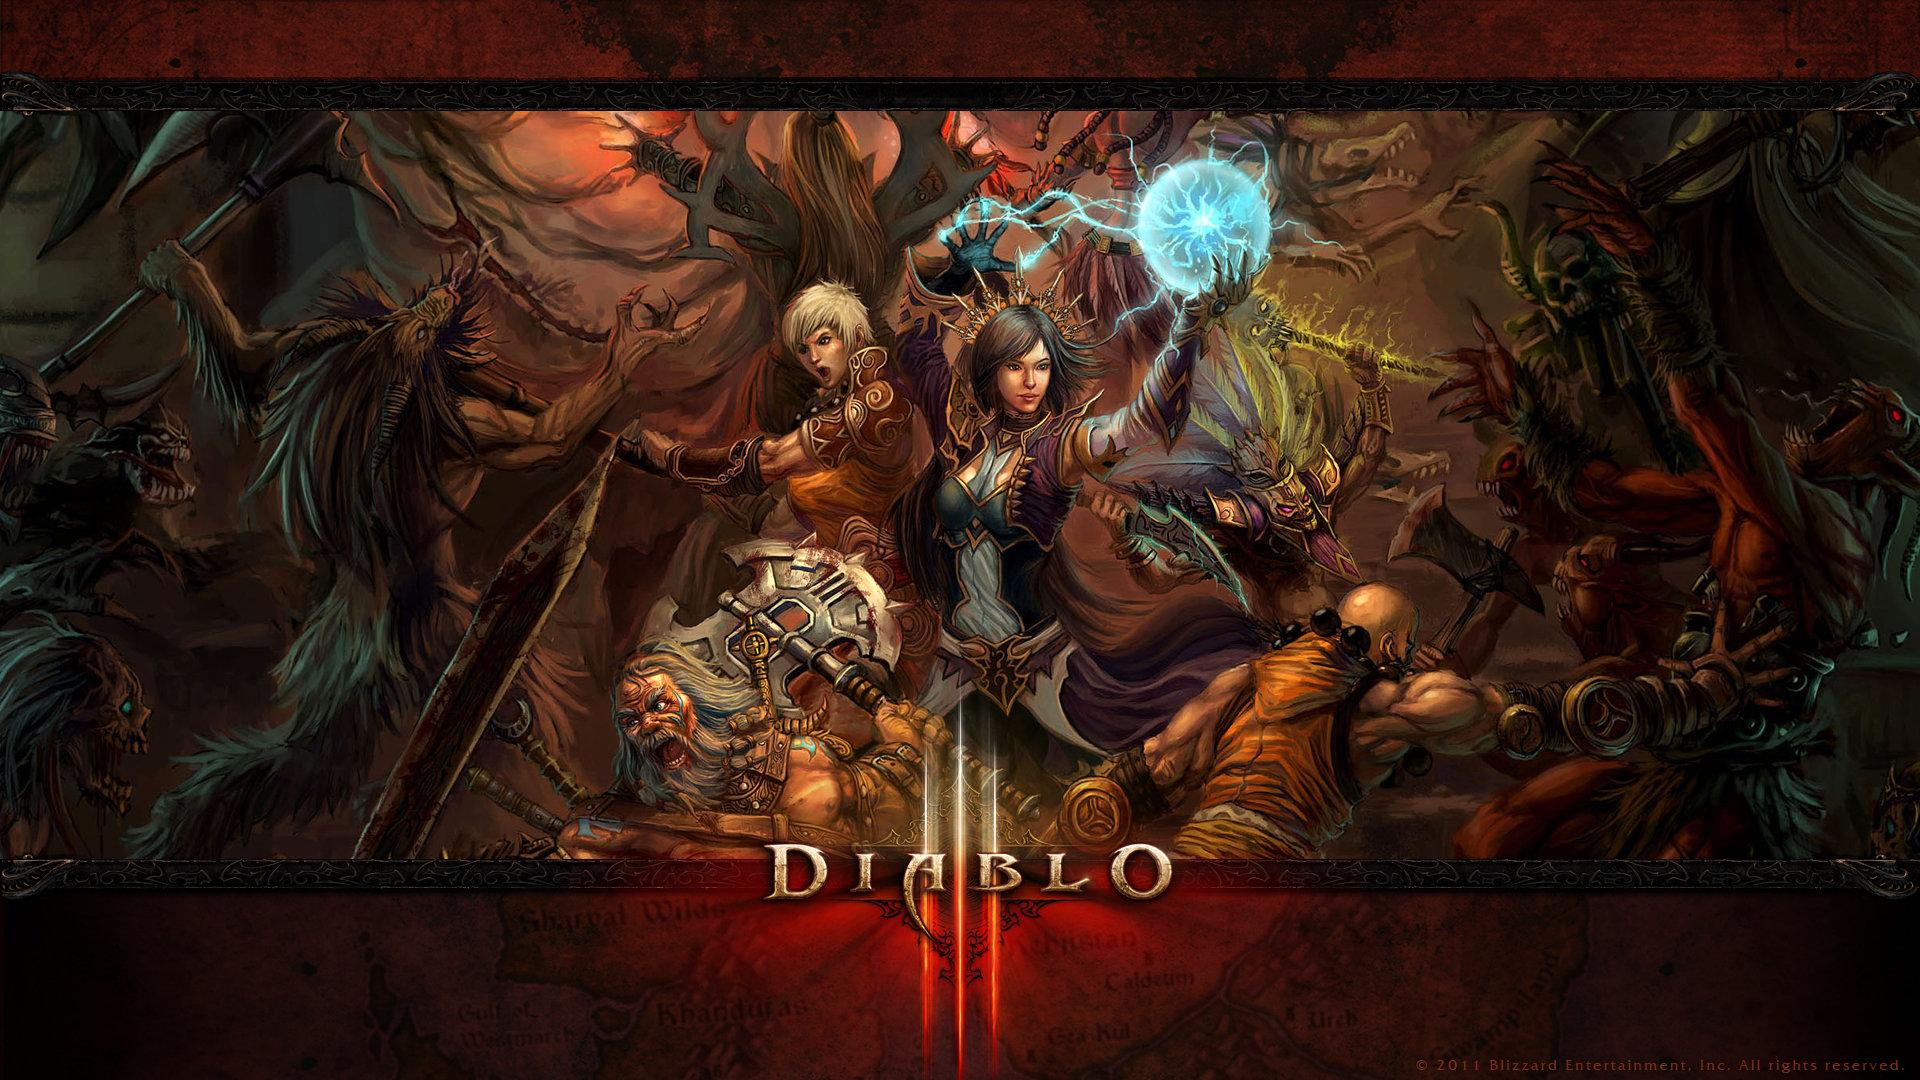 Free Diablo 3 high quality wallpaper ID:30946 for full hd 1920x1080 desktop